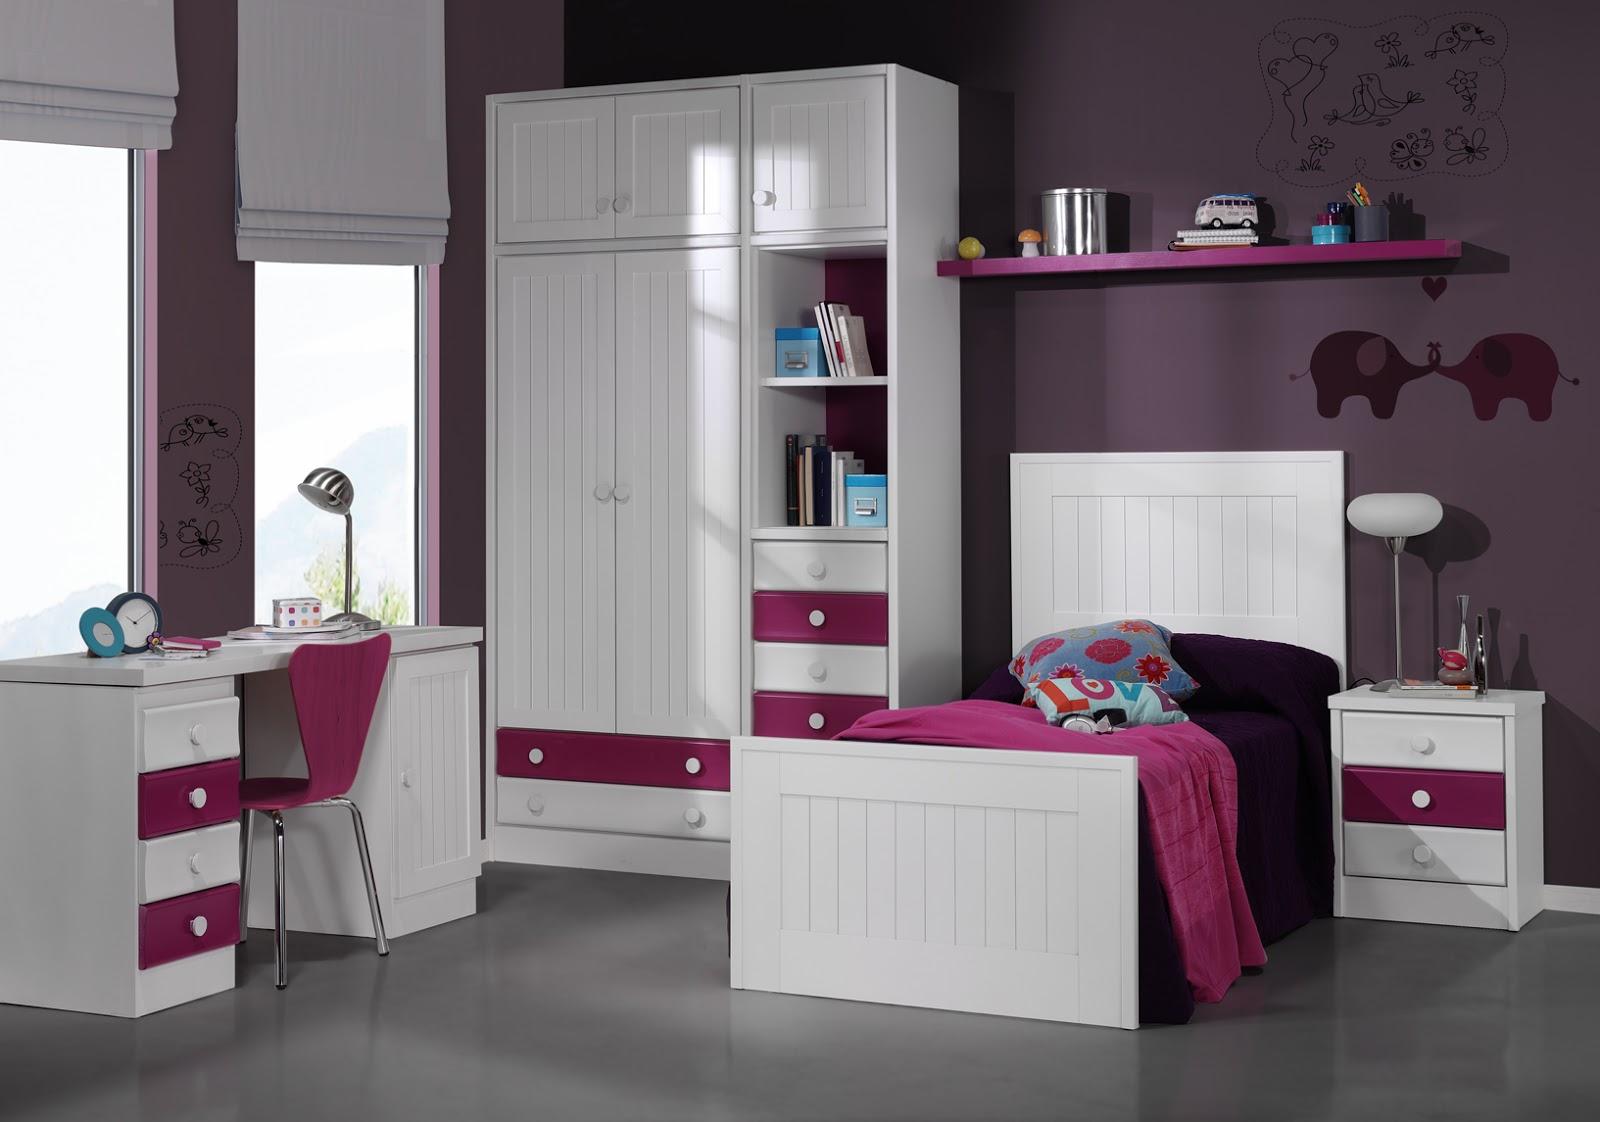 Muebles eduardo tallero catalogo 27 1 dormitorio juvenil for Camas individuales juveniles